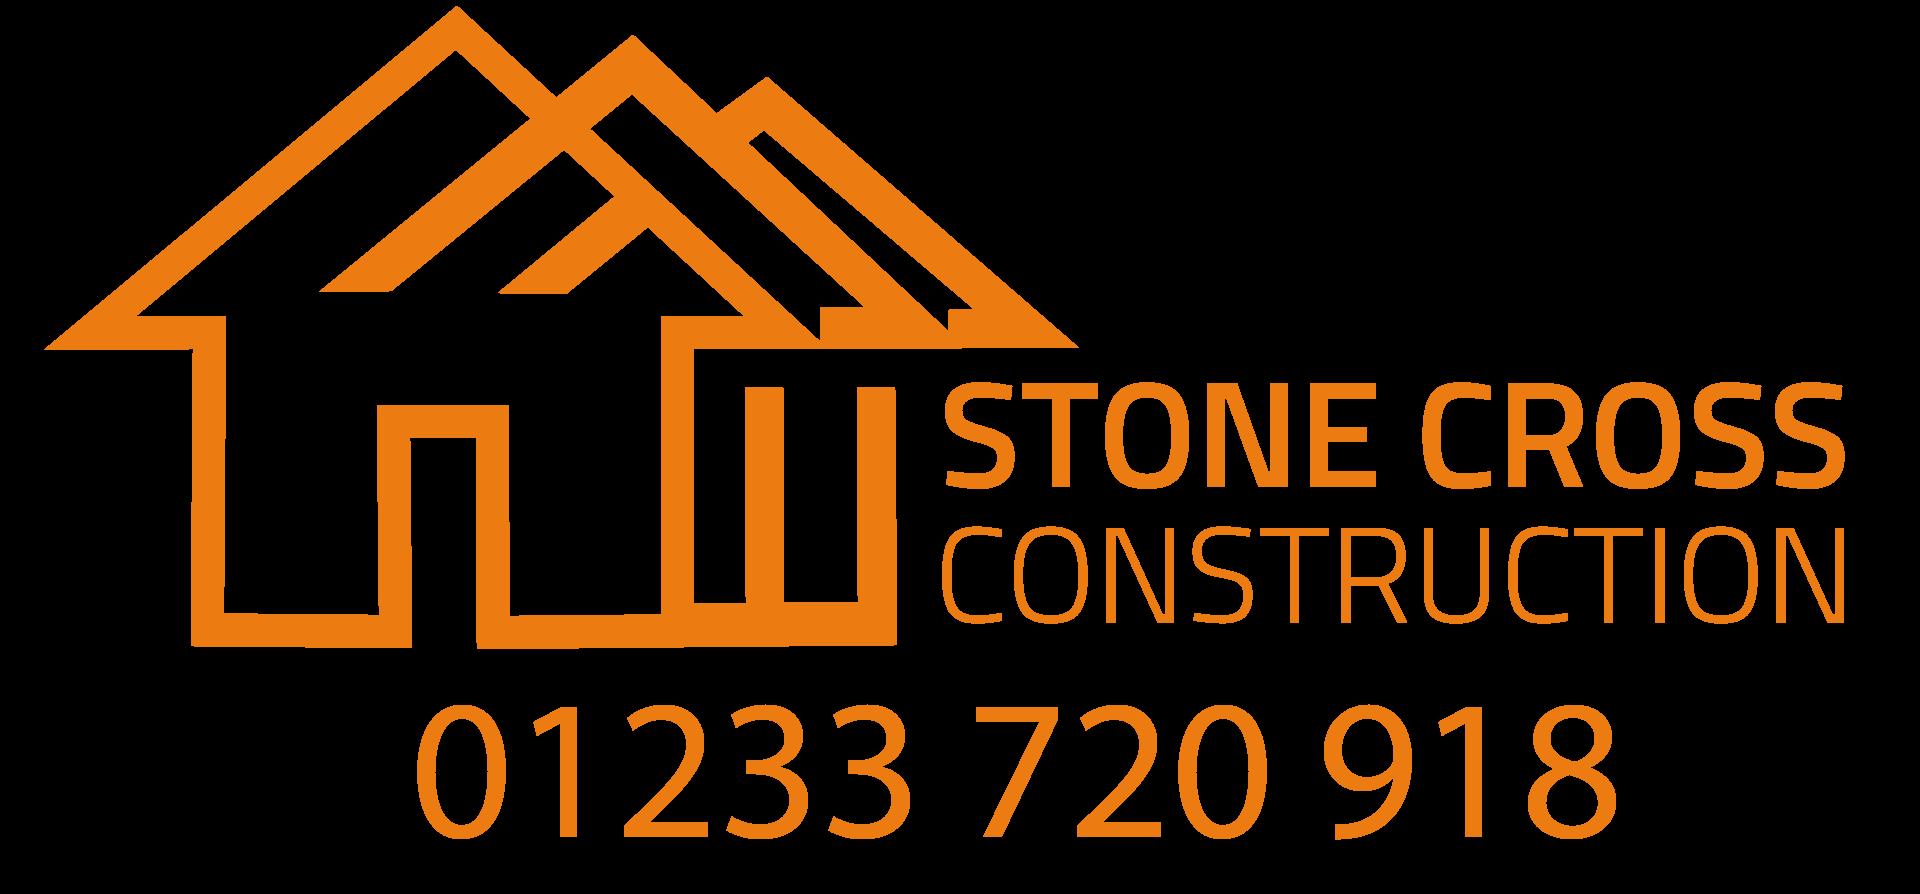 Stone Cross Construction South East Ltd